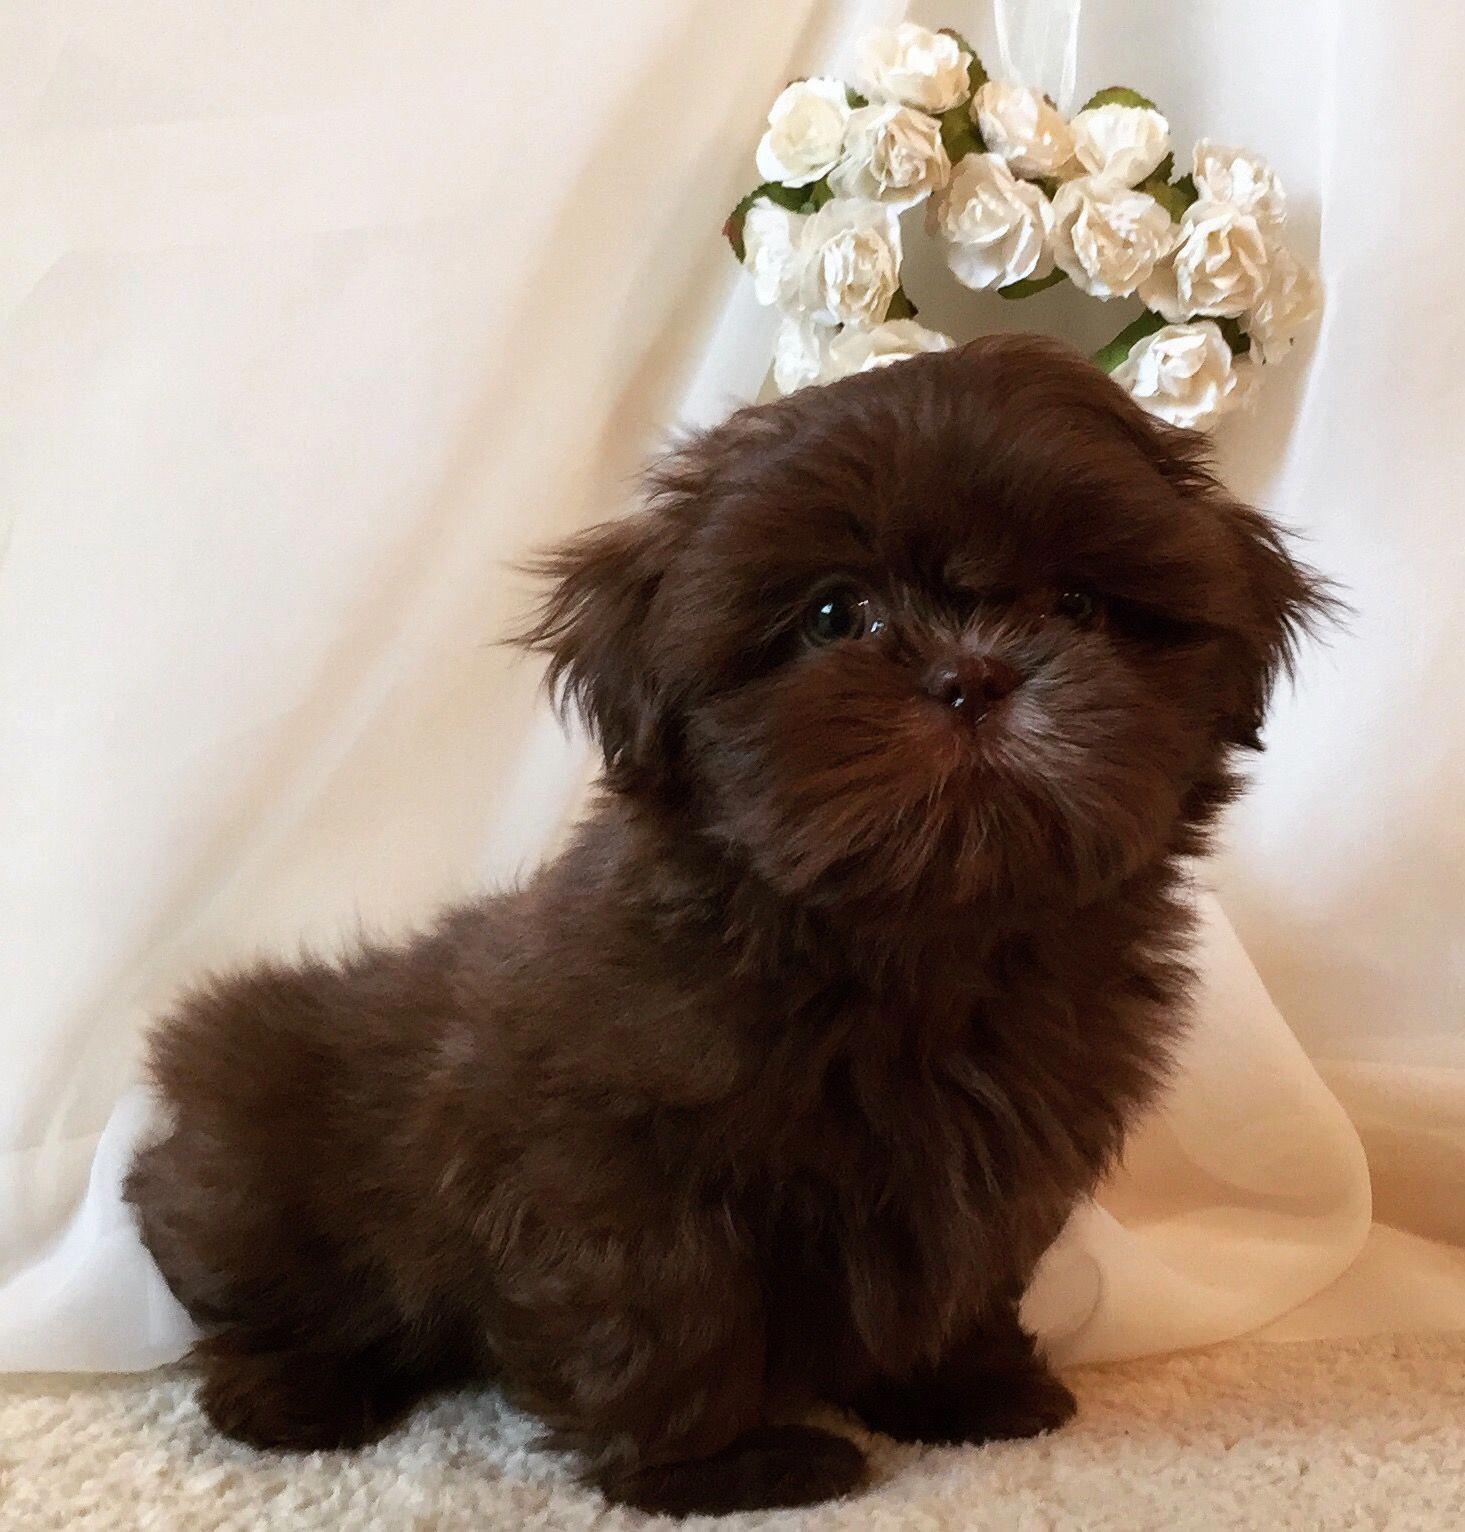 Shih Tzu Affectionate And Playful Shih Tzu Puppy Shih Tzu Dog Puppies